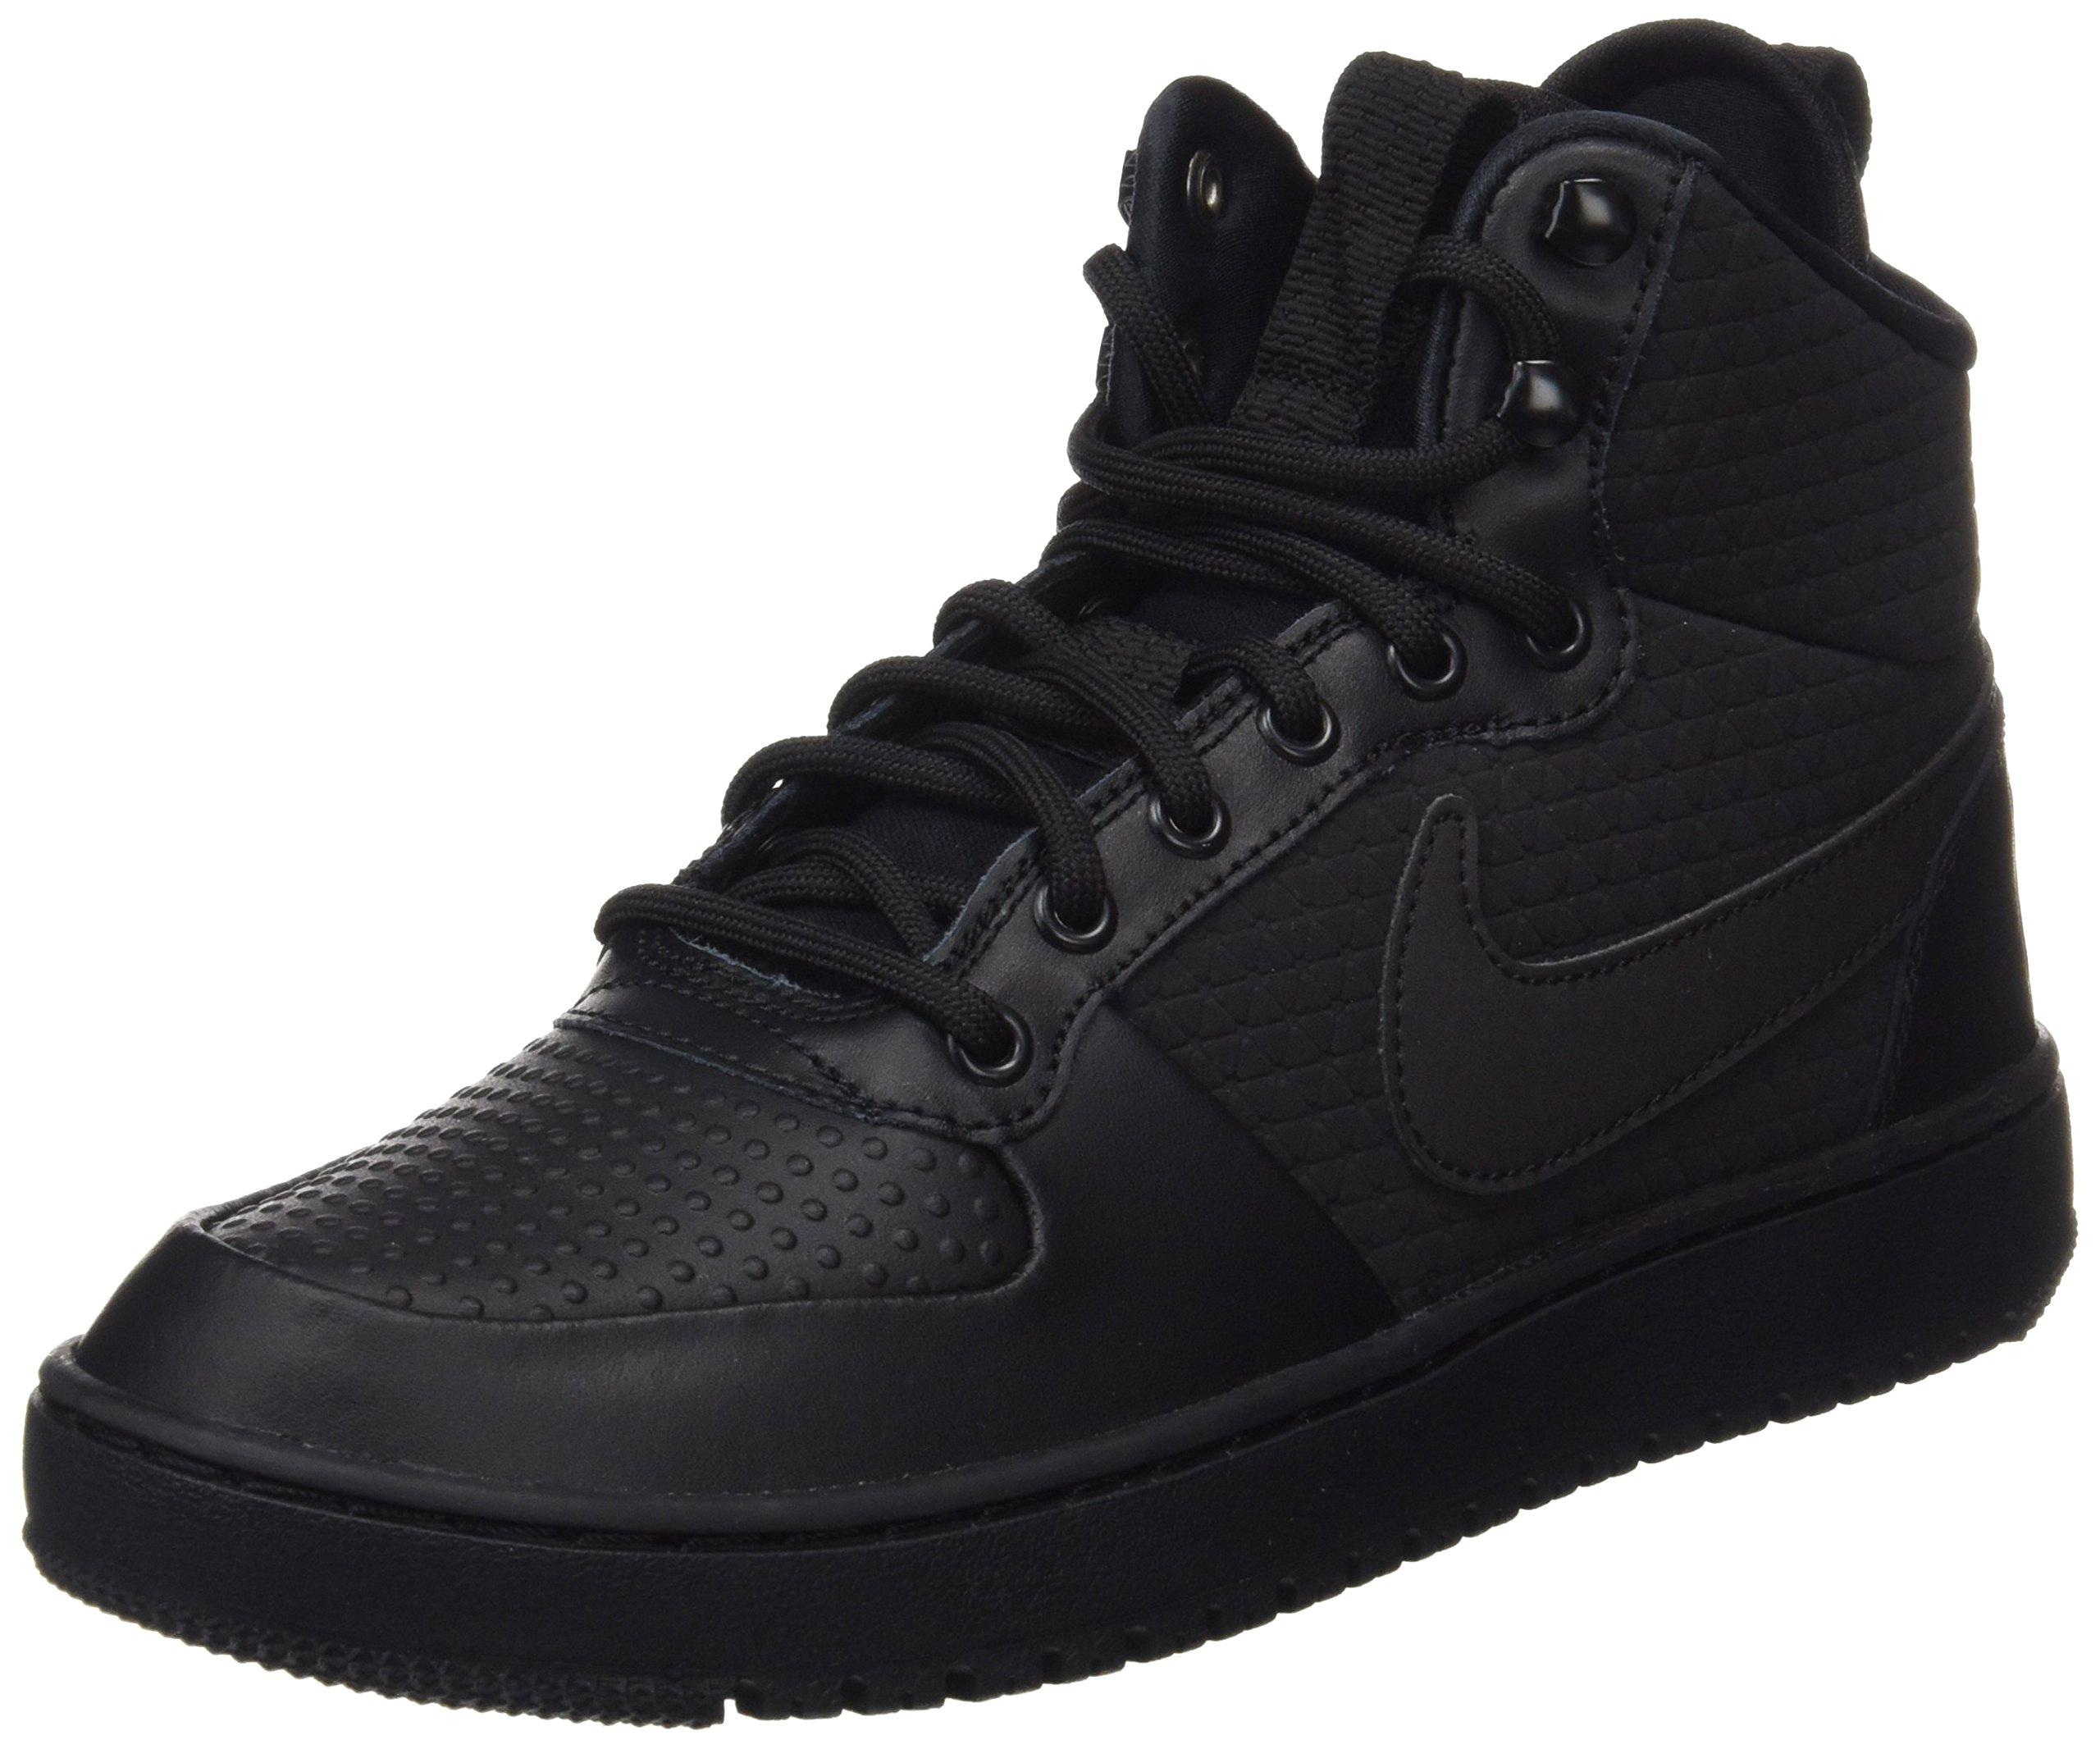 7787bf2b49 Galleon - Nike Court Borough Mid Winter Men s Waterproof Basketball Shoes  (8 D(M) US